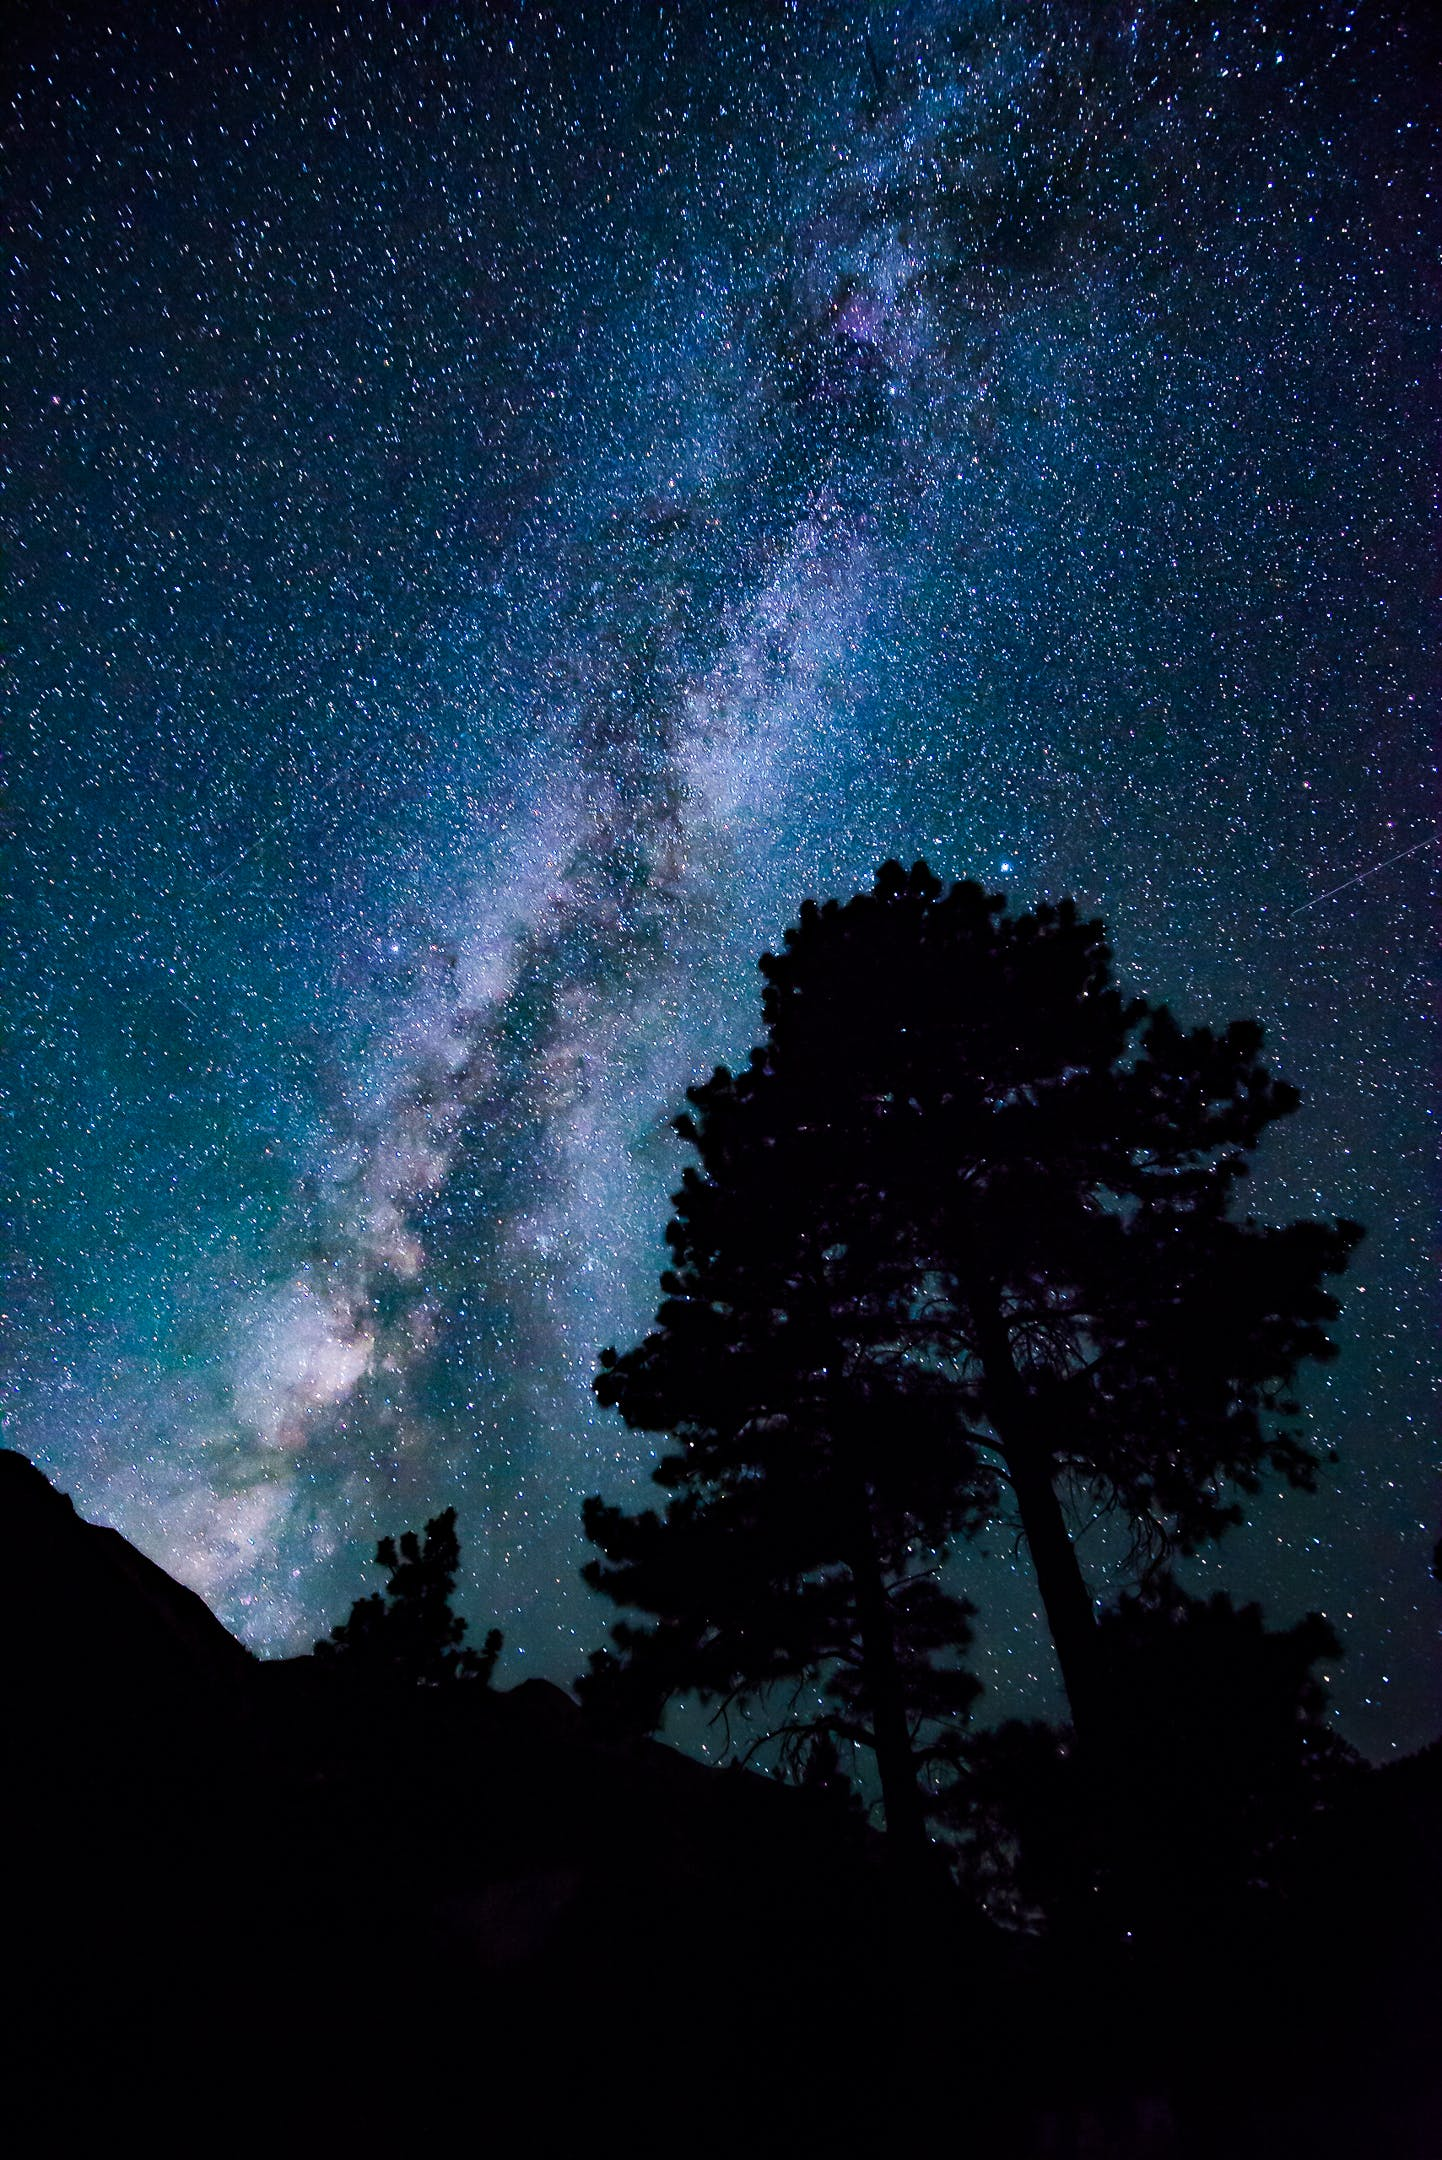 Gratis lagerfoto af astrofotografering, astronomi, galakse, konstellation